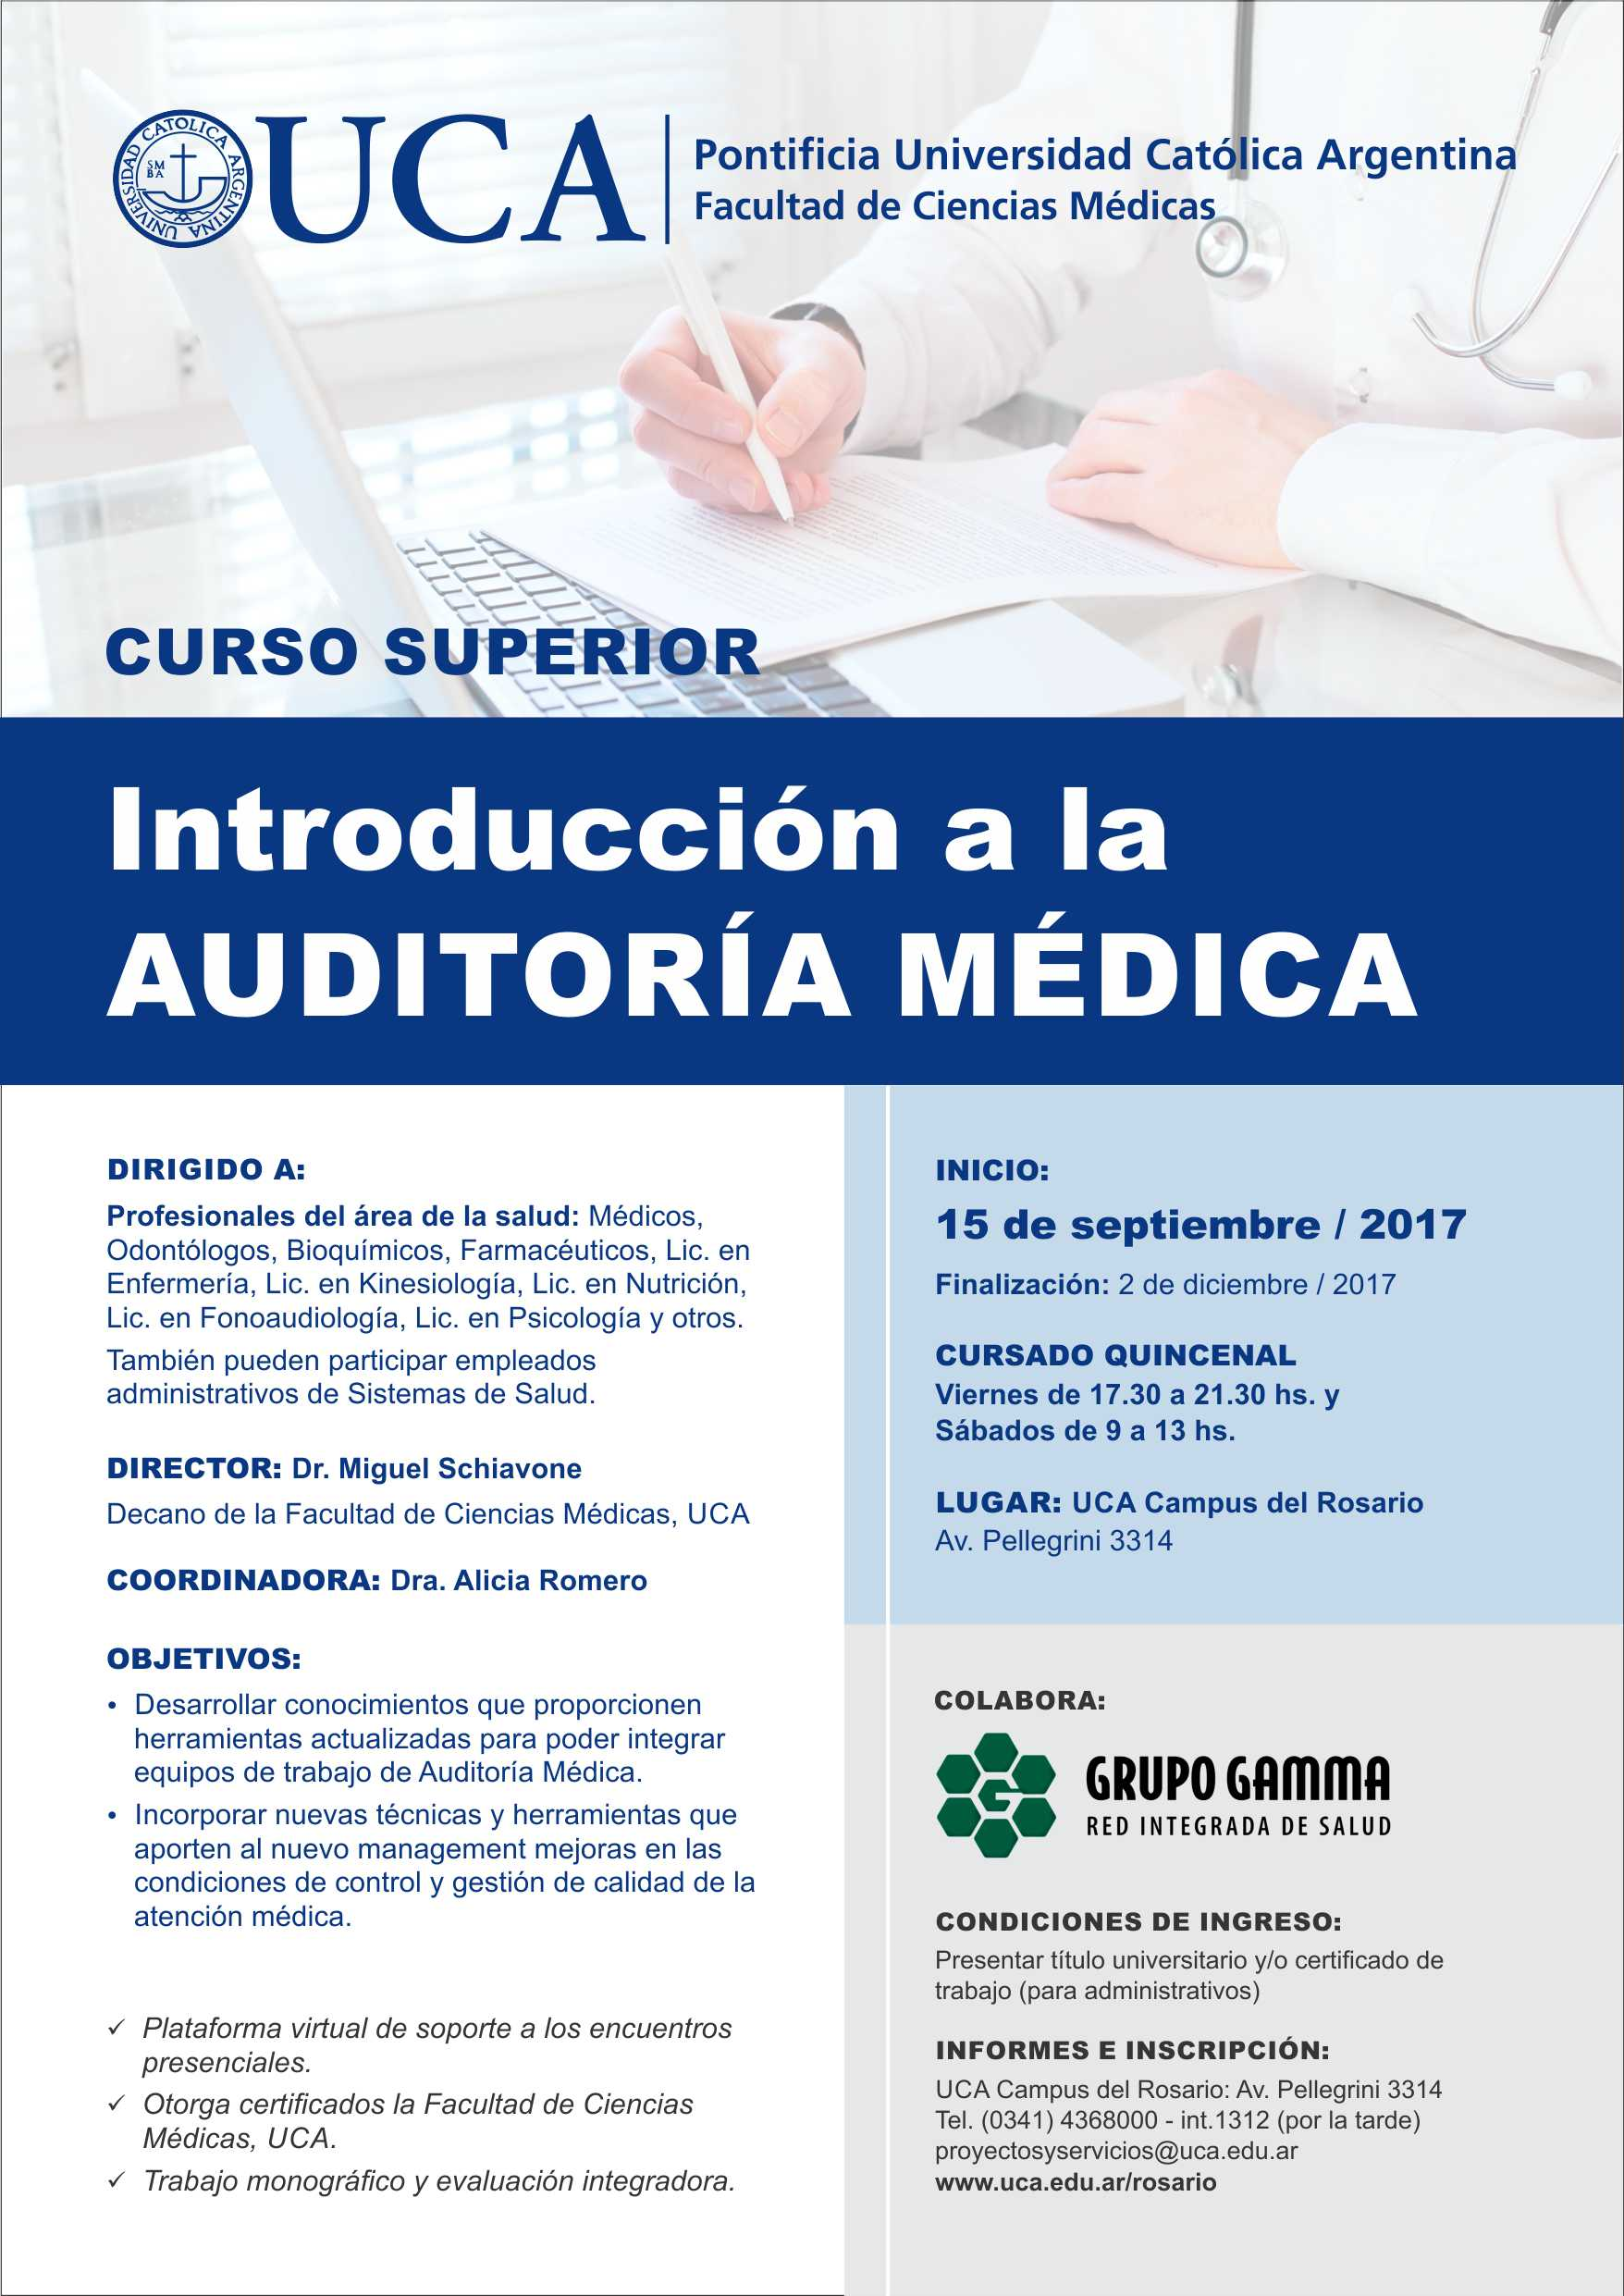 Curso Superior en Auditoría Médica | Grupo Gamma